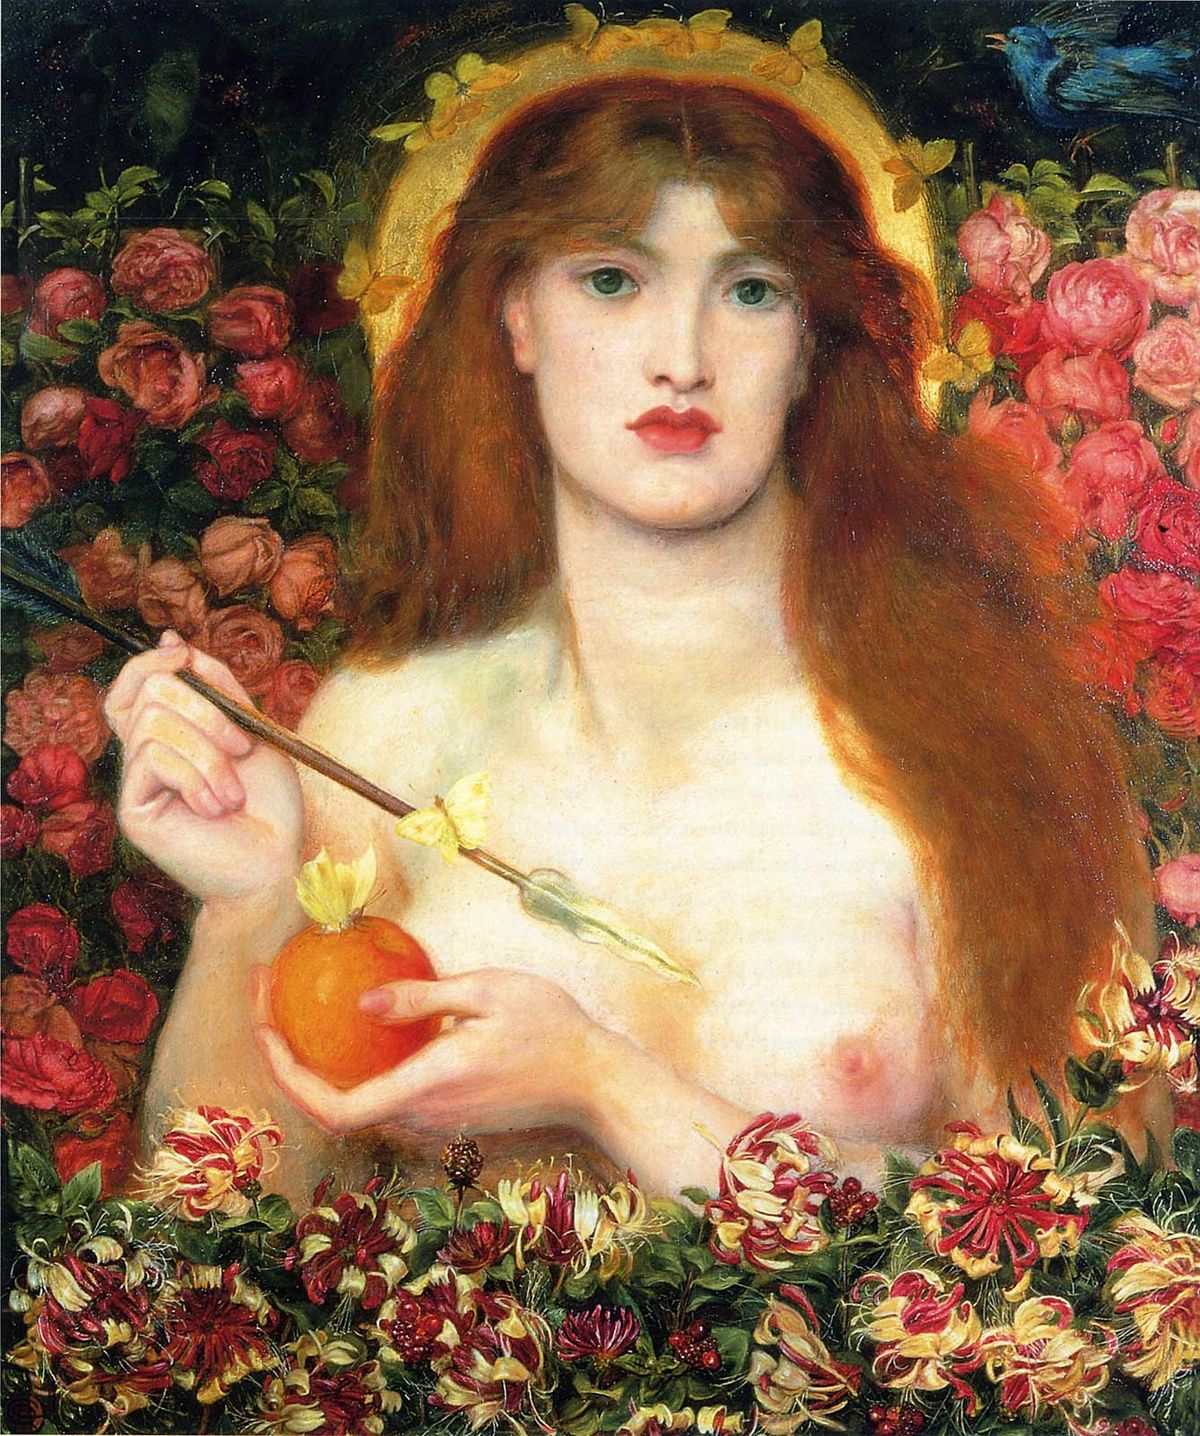 Venus_Verticordia_-_Dante_Rossetti_-_1866